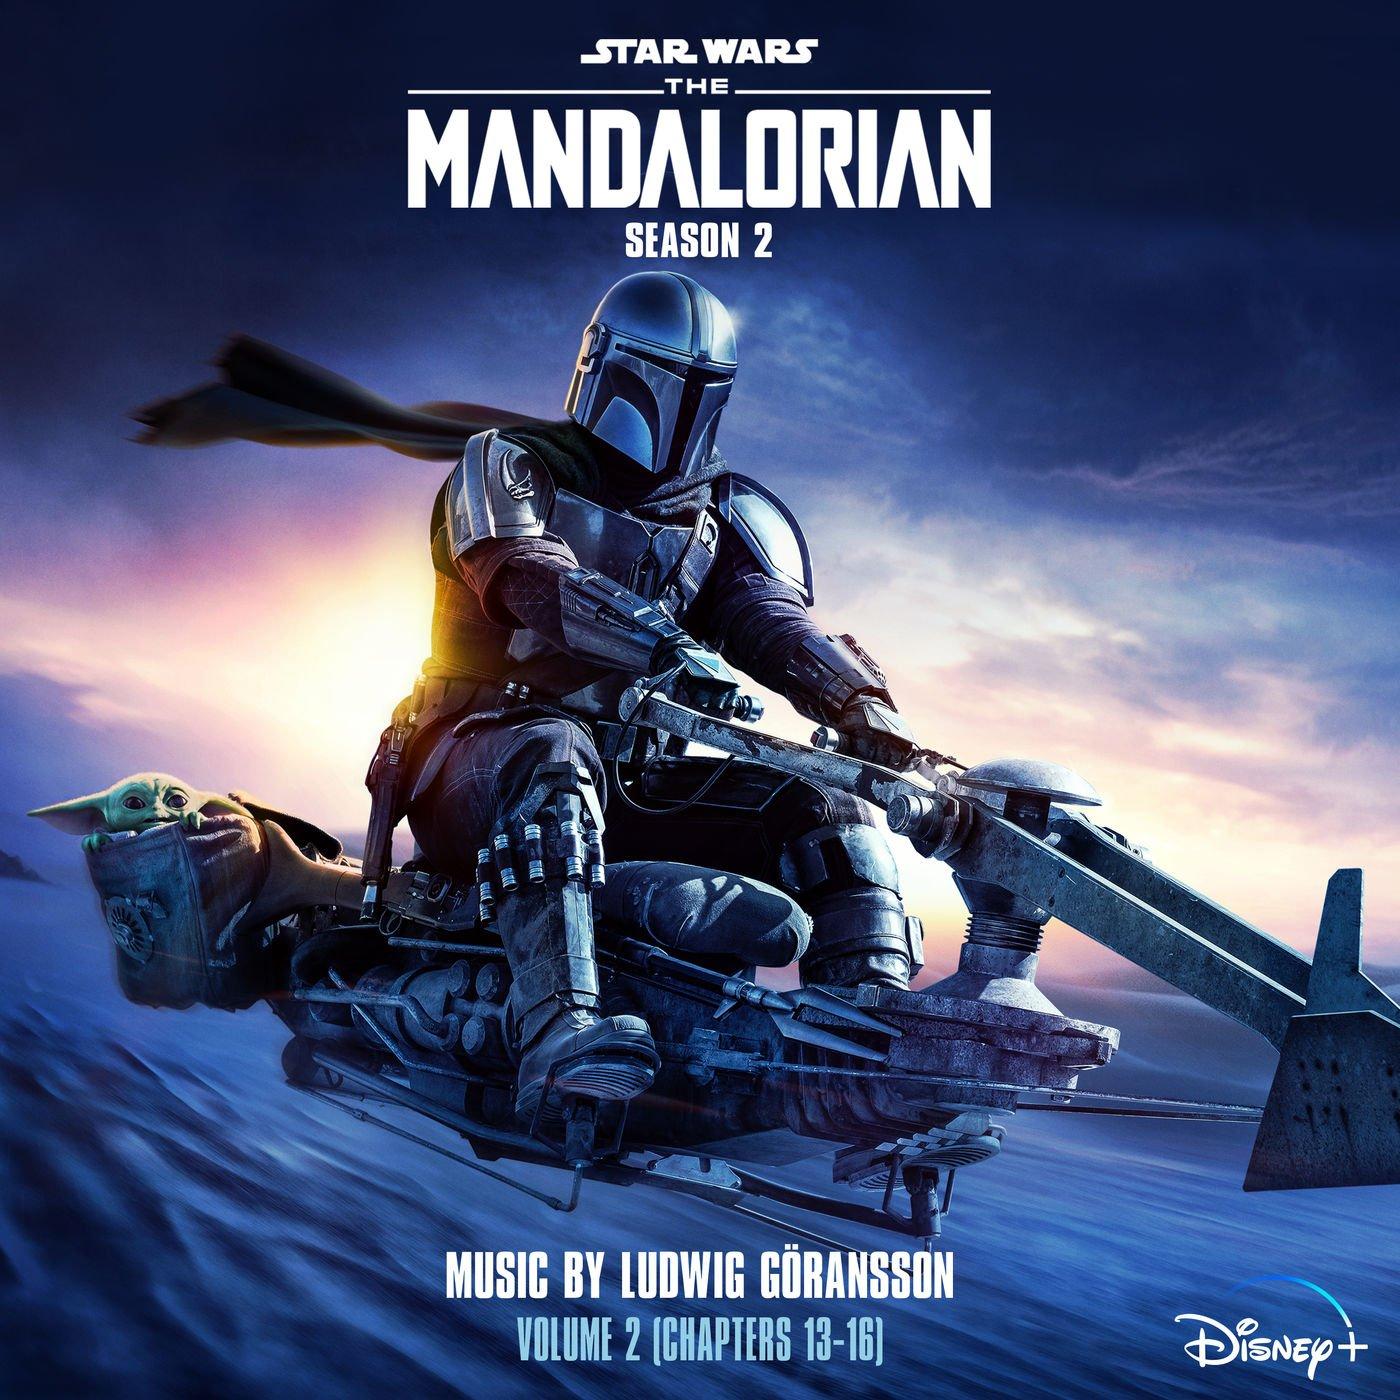 Ludwig Goransson - The Mandalorian Season 2 Vol. 2 Chapters 13-16 (2020) CD